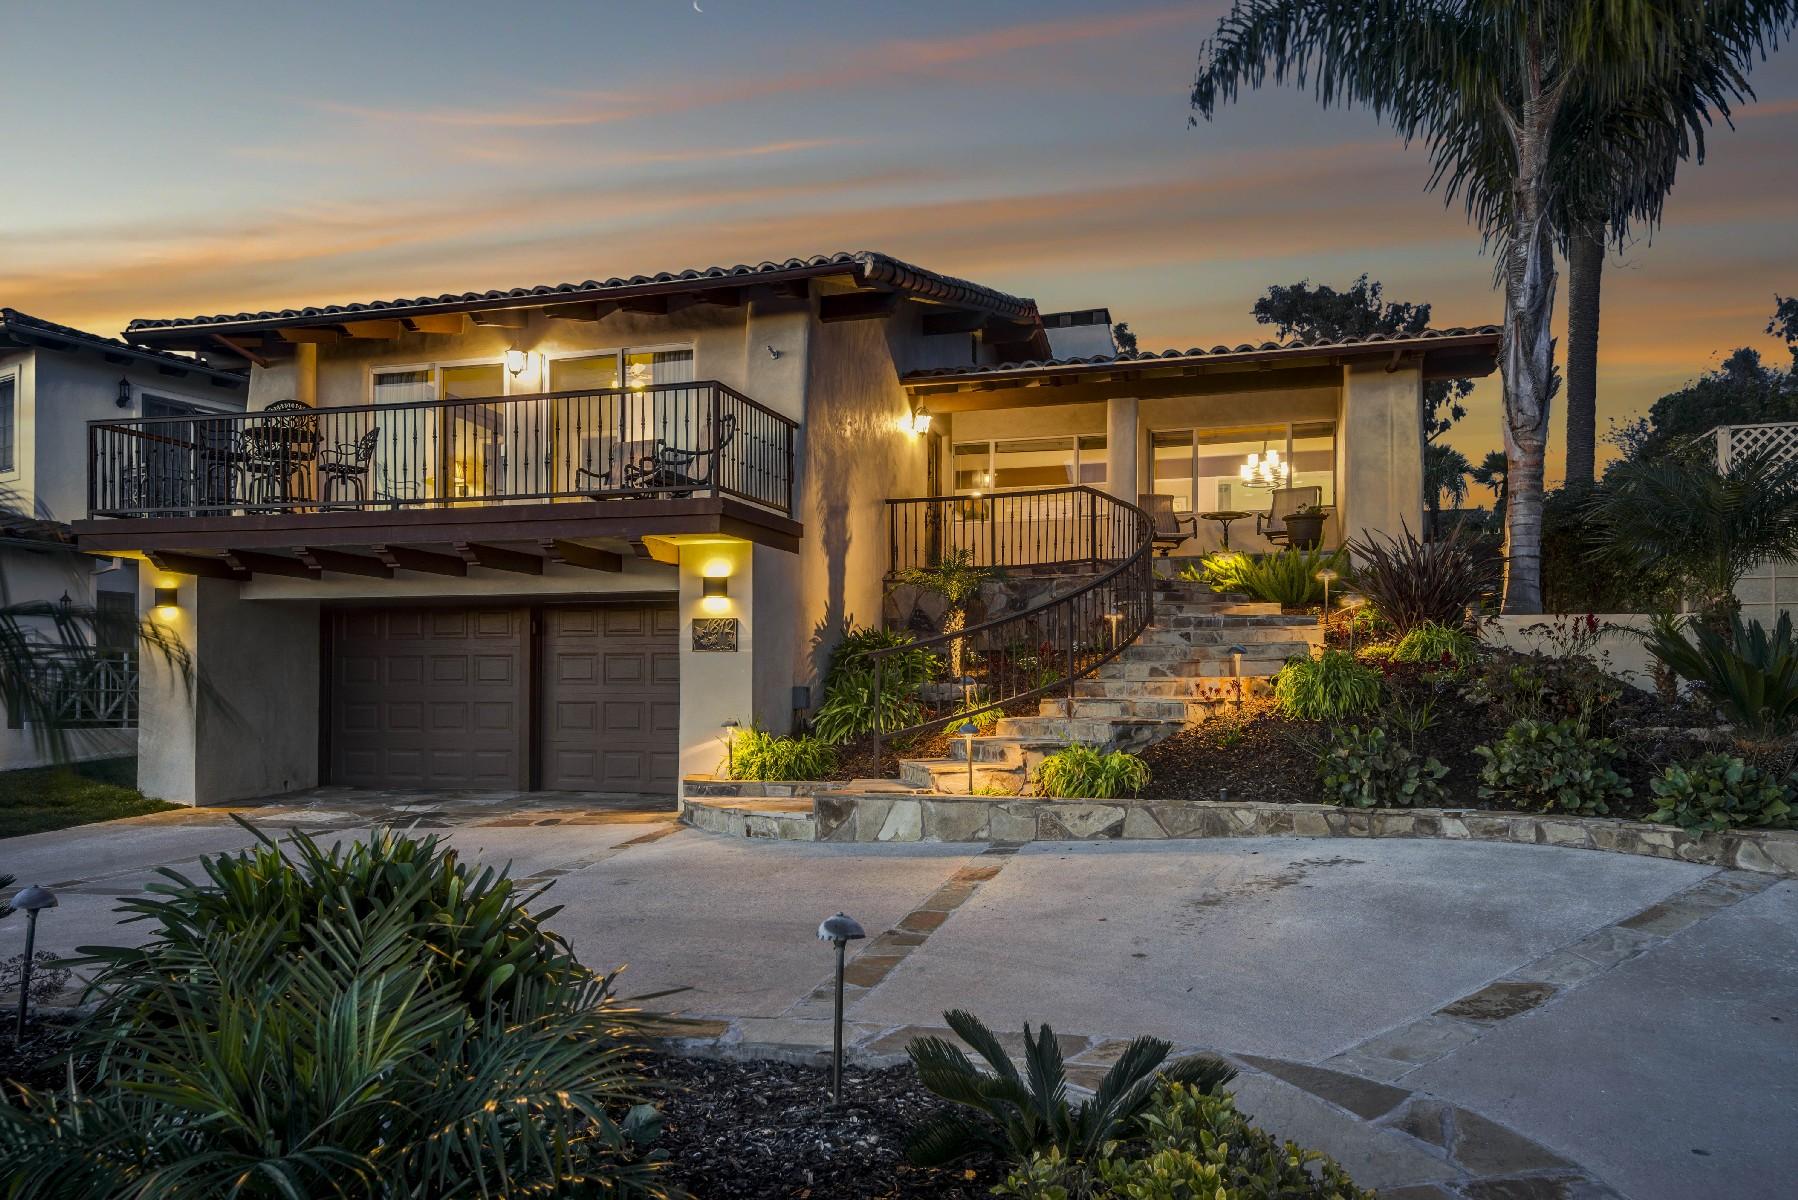 sales property at 1812 Dalton Rd, Palos Verdes Estates 90274